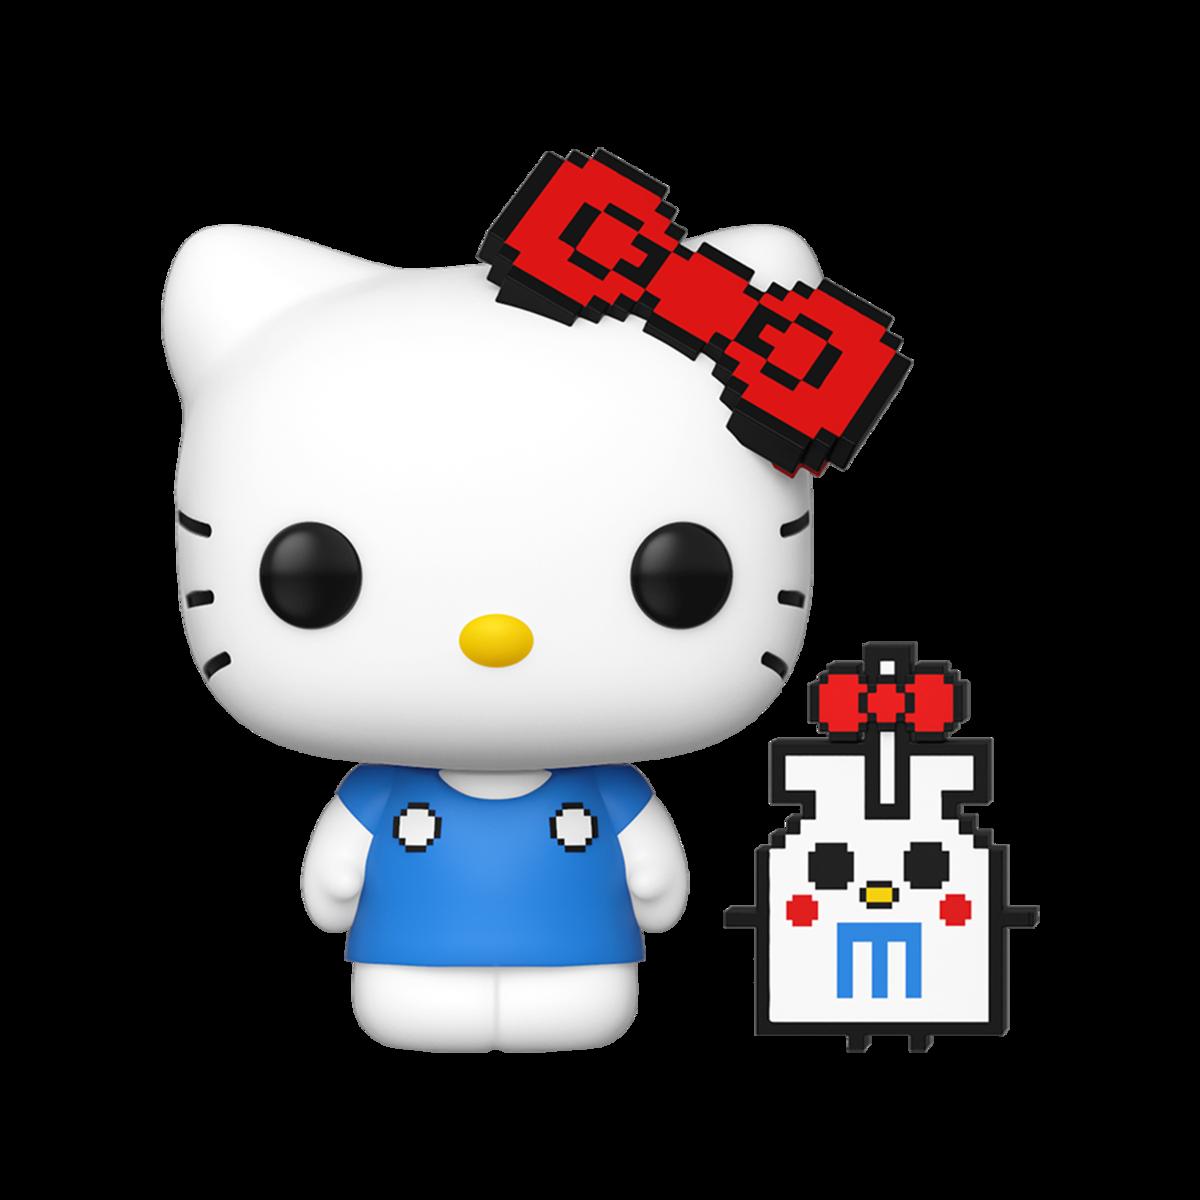 Pop! Sanrio: Hello Kitty (8-Bit) – Funko Shop - Hello Kitty Items